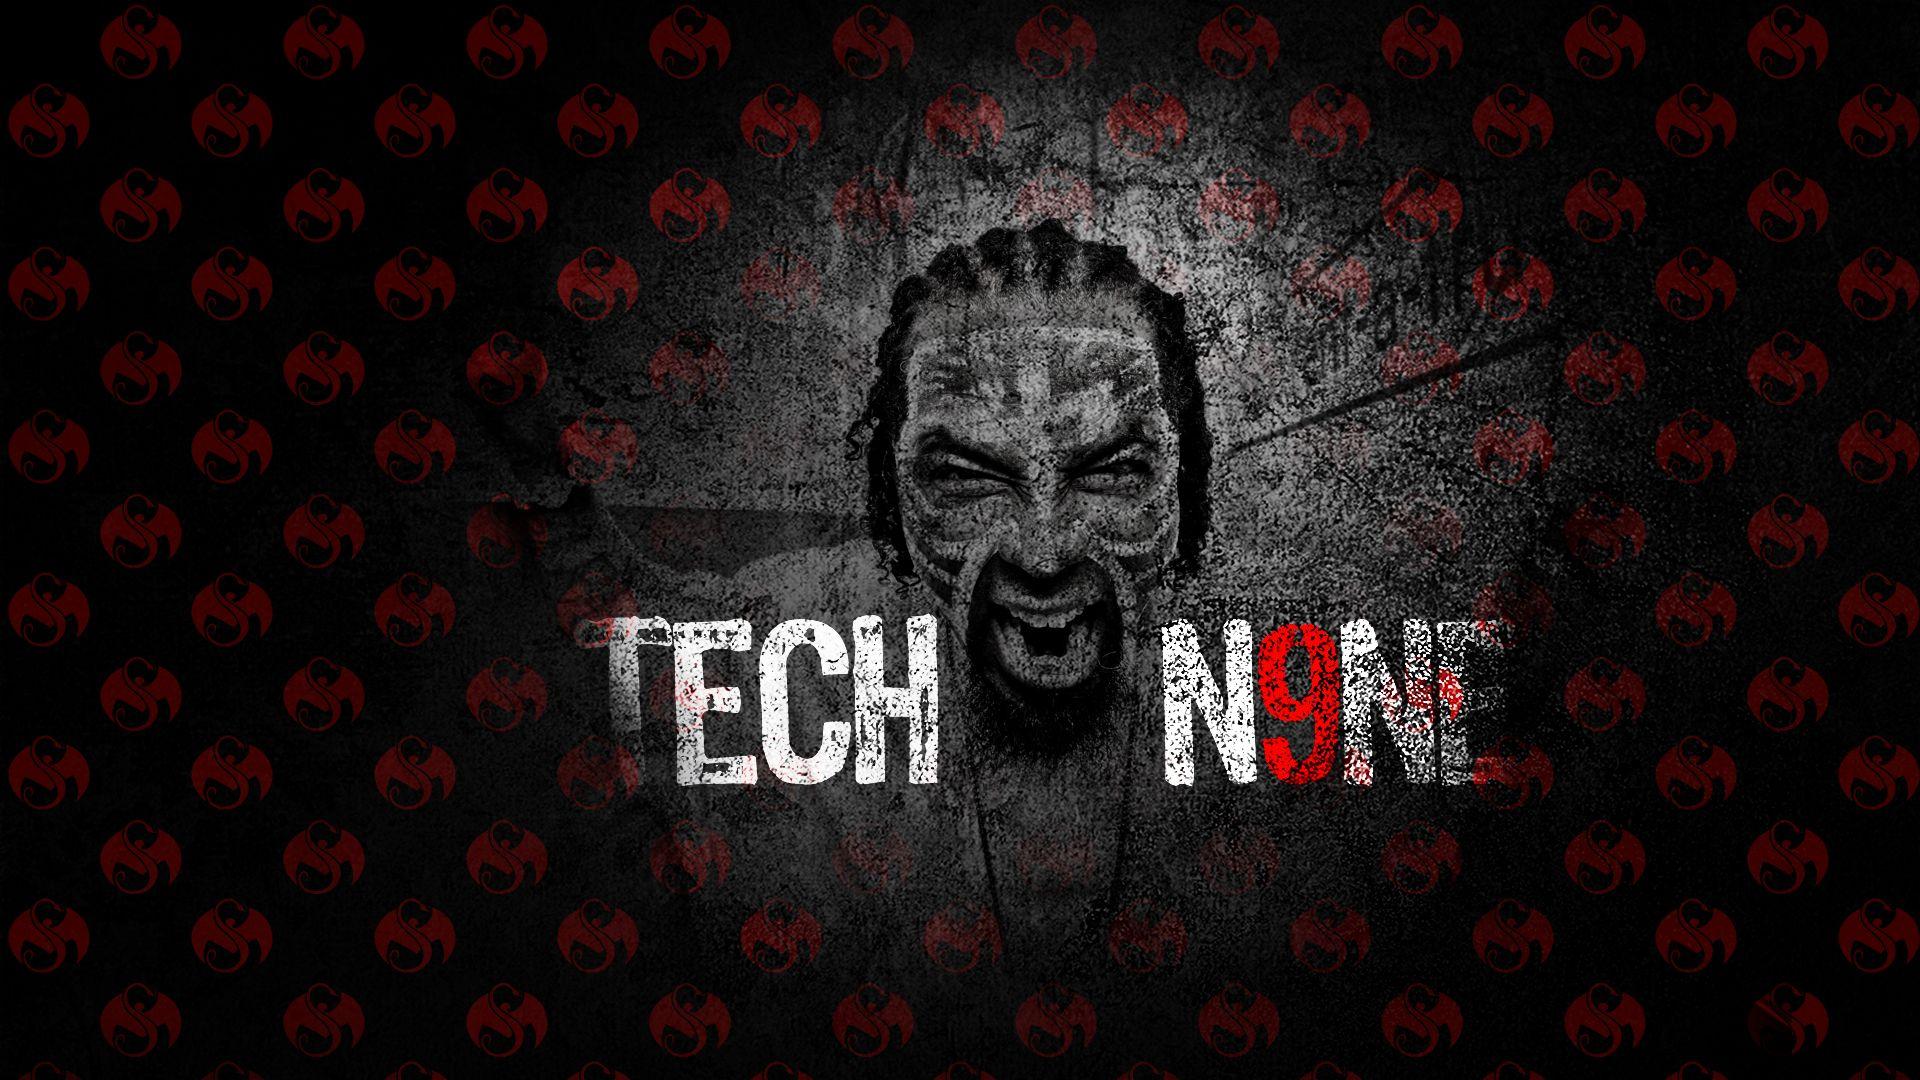 Strange Music Logo Wallpaper: Tech N9ne By Jkingar0und